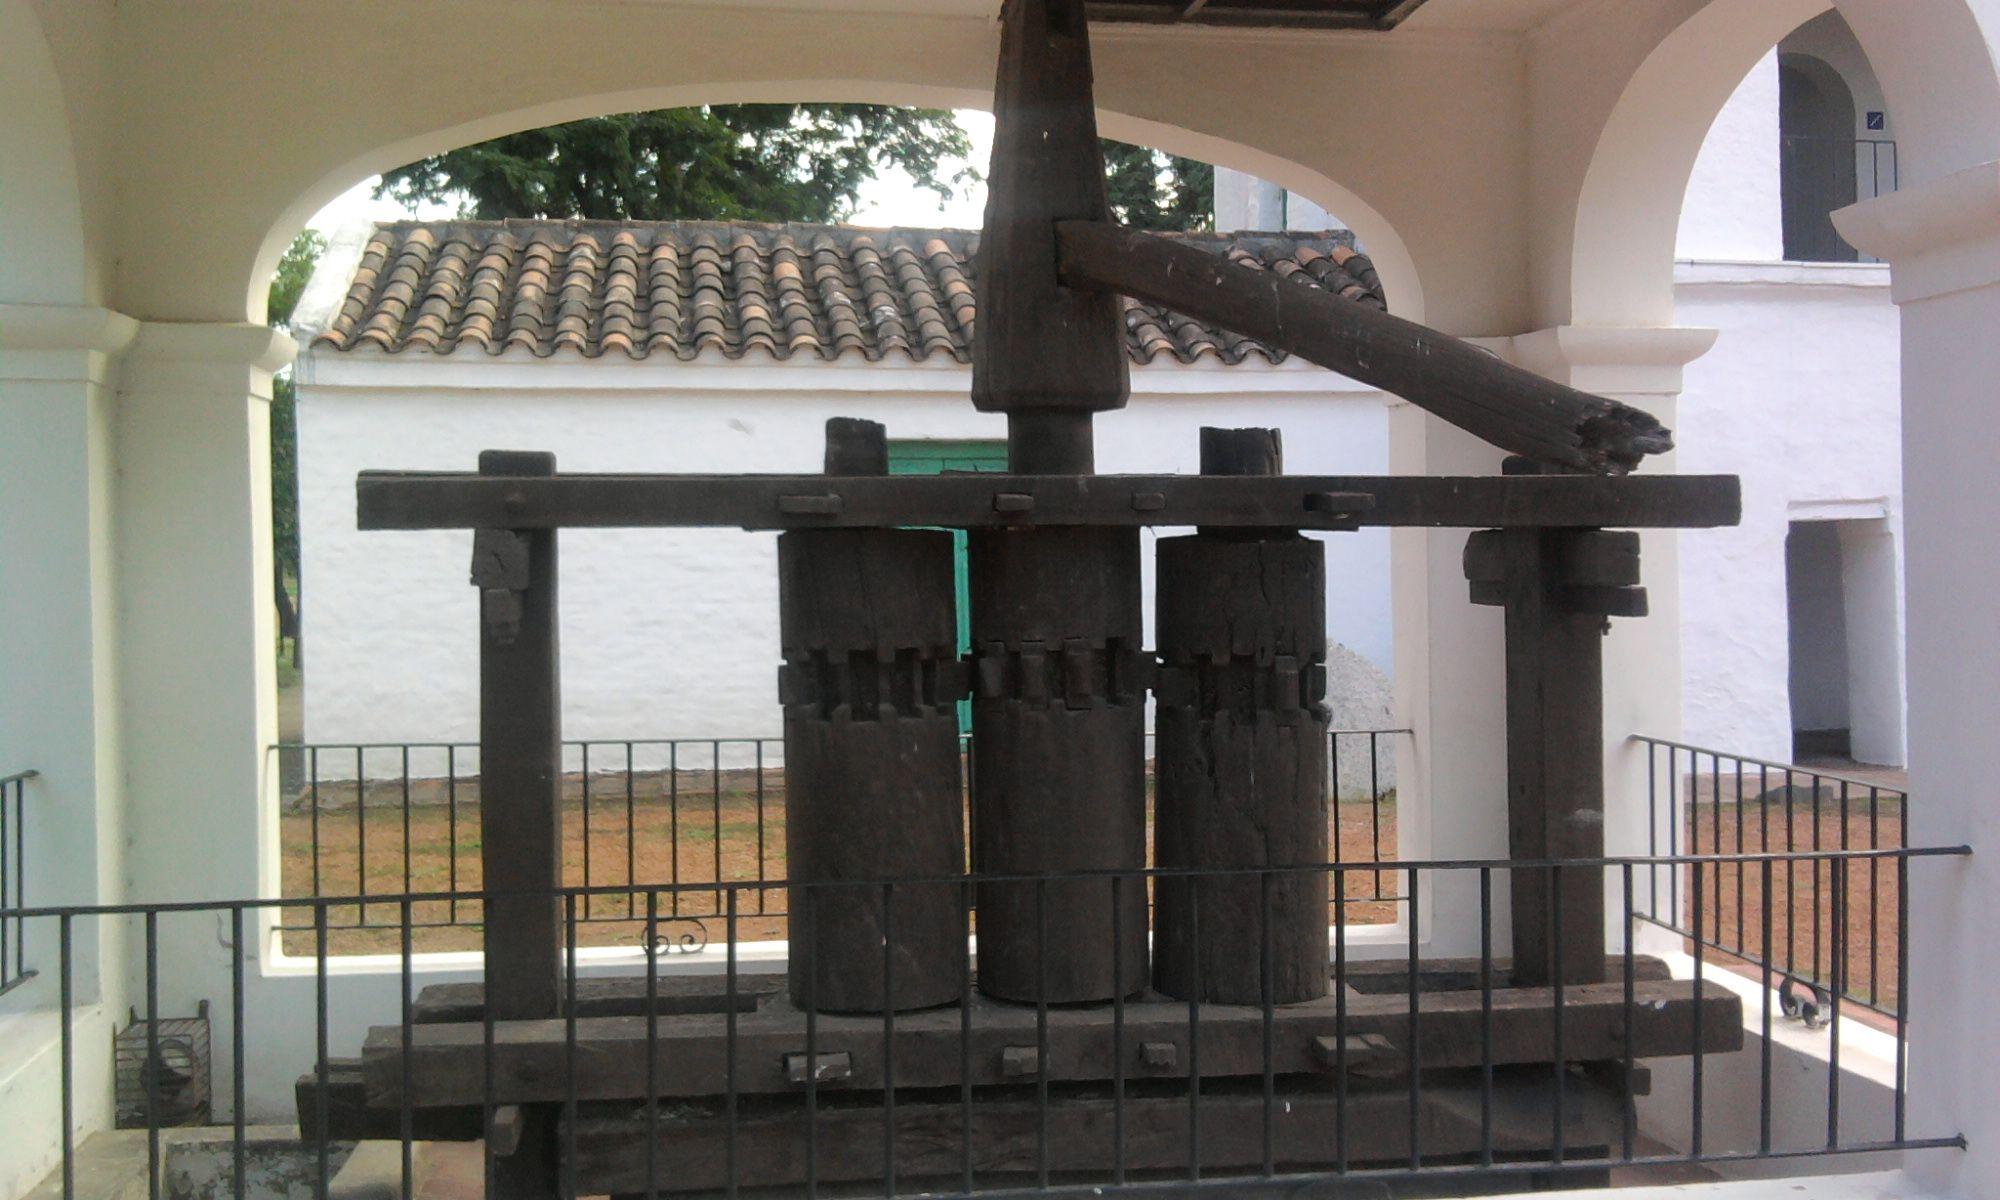 Primer Trapiche Para La Cana De Azucar Casa Del Obispo Colombres Parque 9 De Julio San Miguel De Tucuman Argentina 2 010 Lamp Post Structures